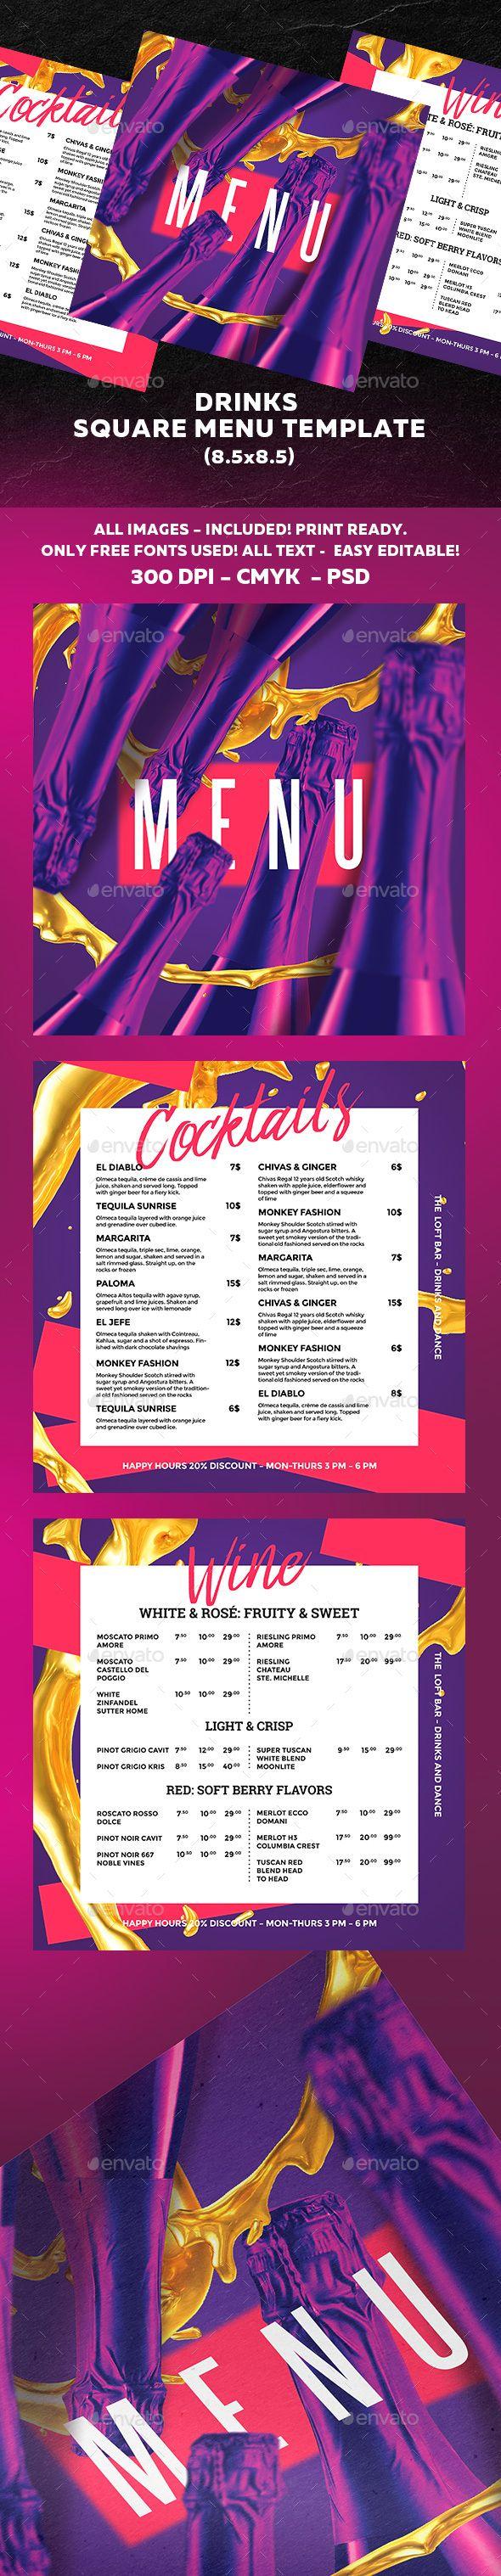 Drinks Menu Drink Menu Menu Templates And Template - Beverage menu template